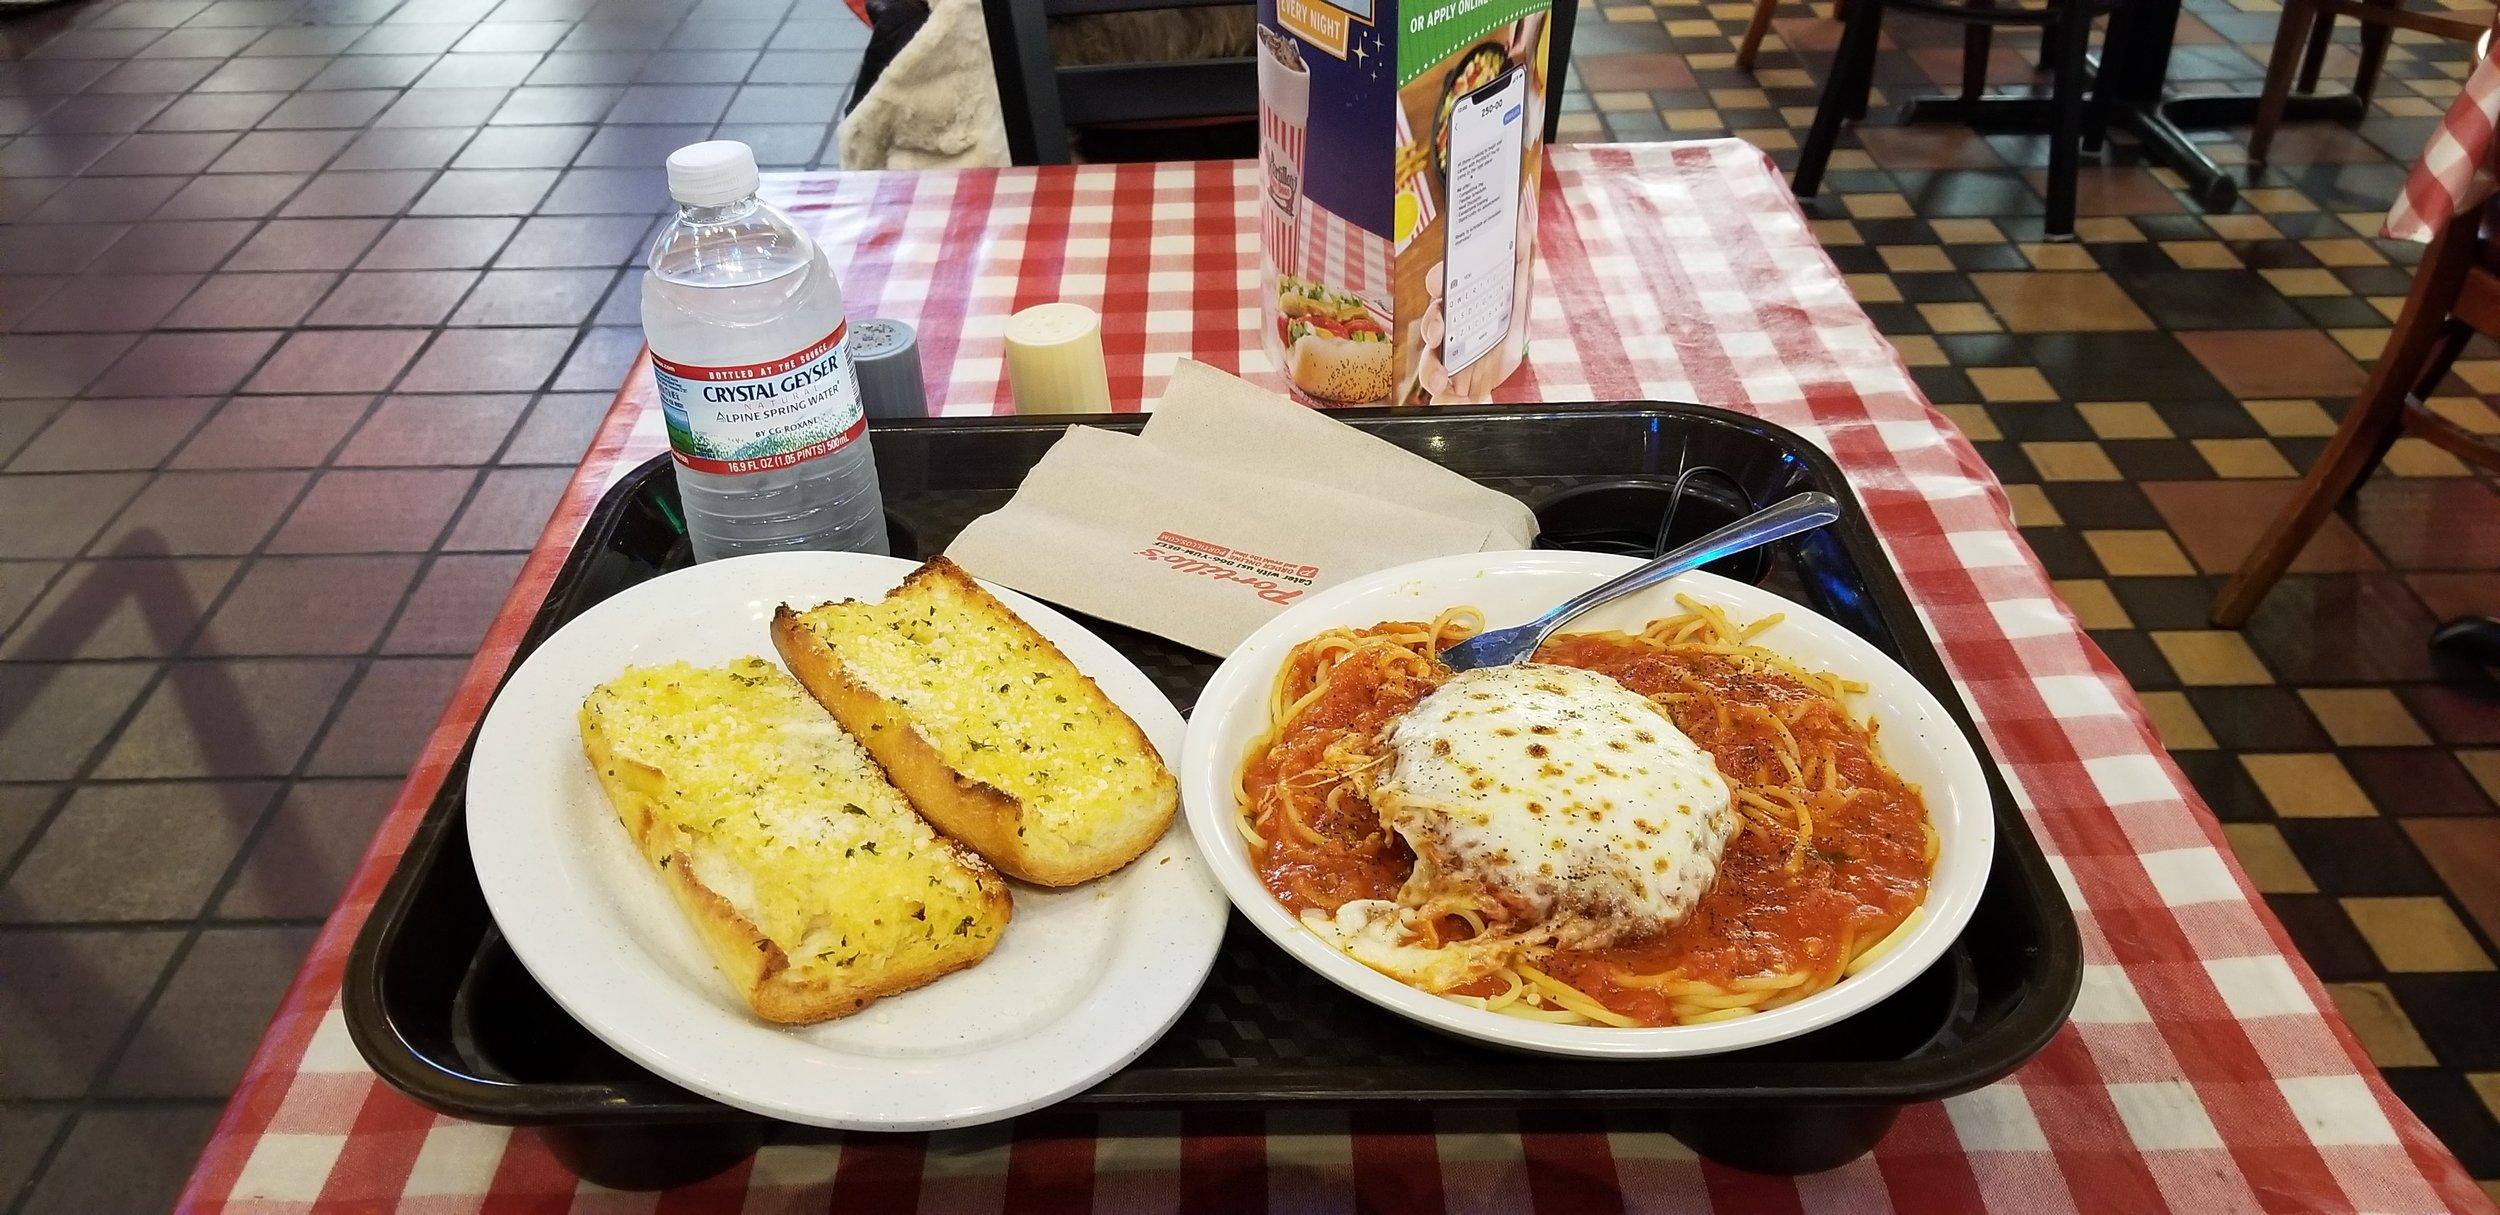 Pasta Lunch at Barnelli's